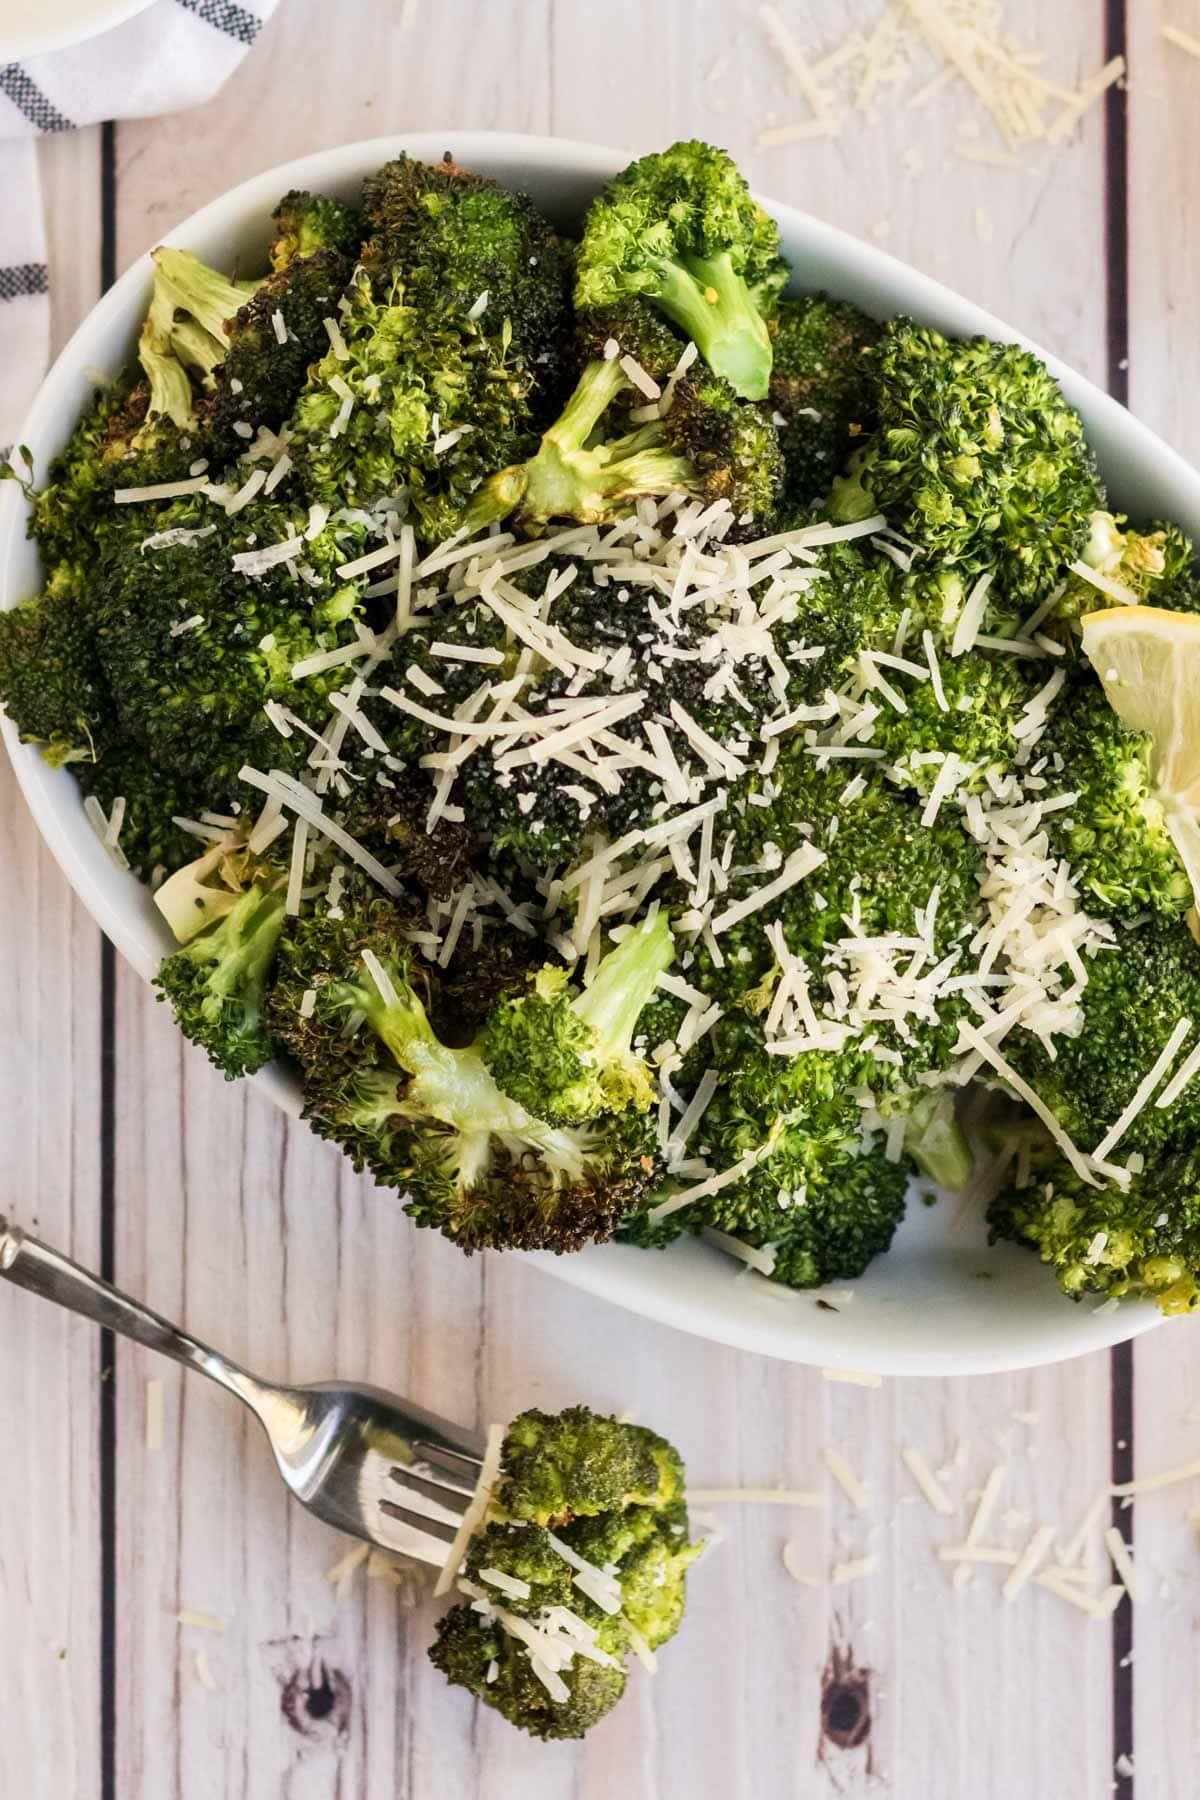 broccoli, white casserole dish, fork, parmesan cheese, lemon